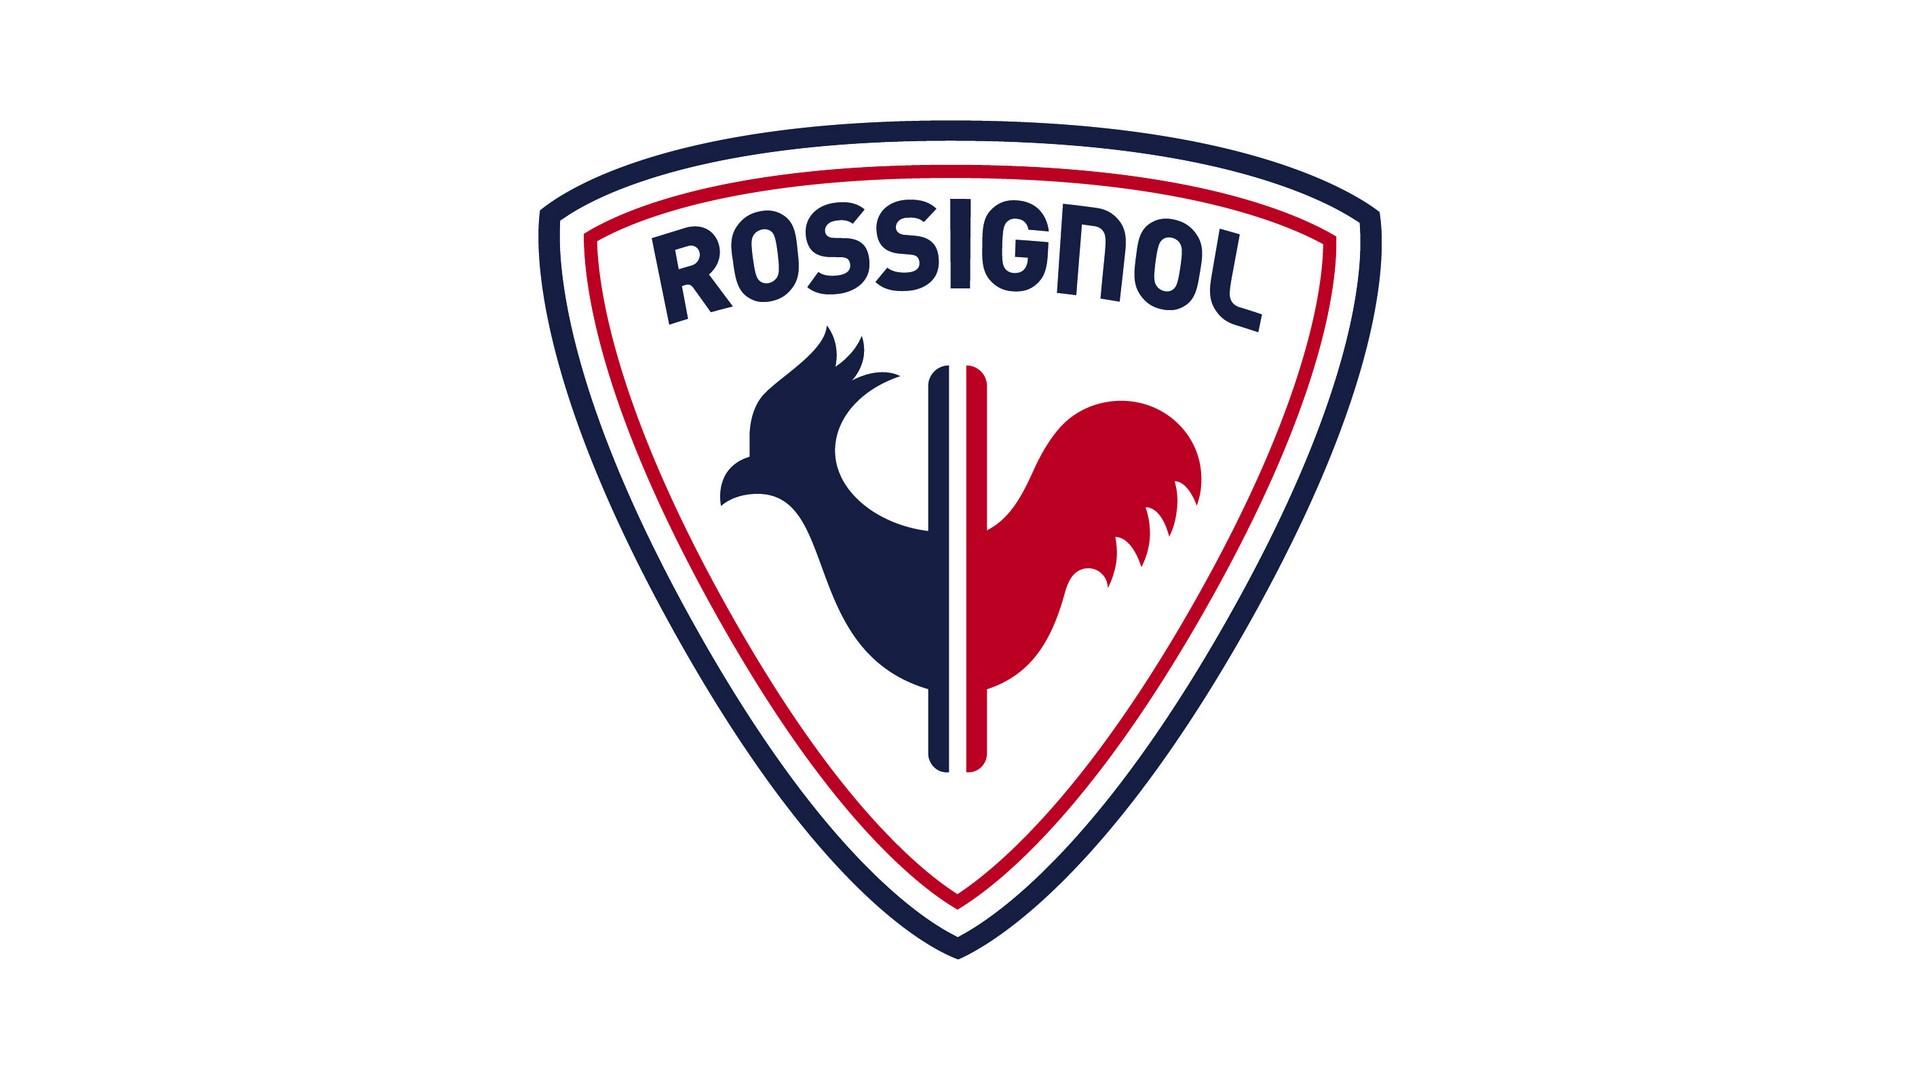 Rossignol (1) logo